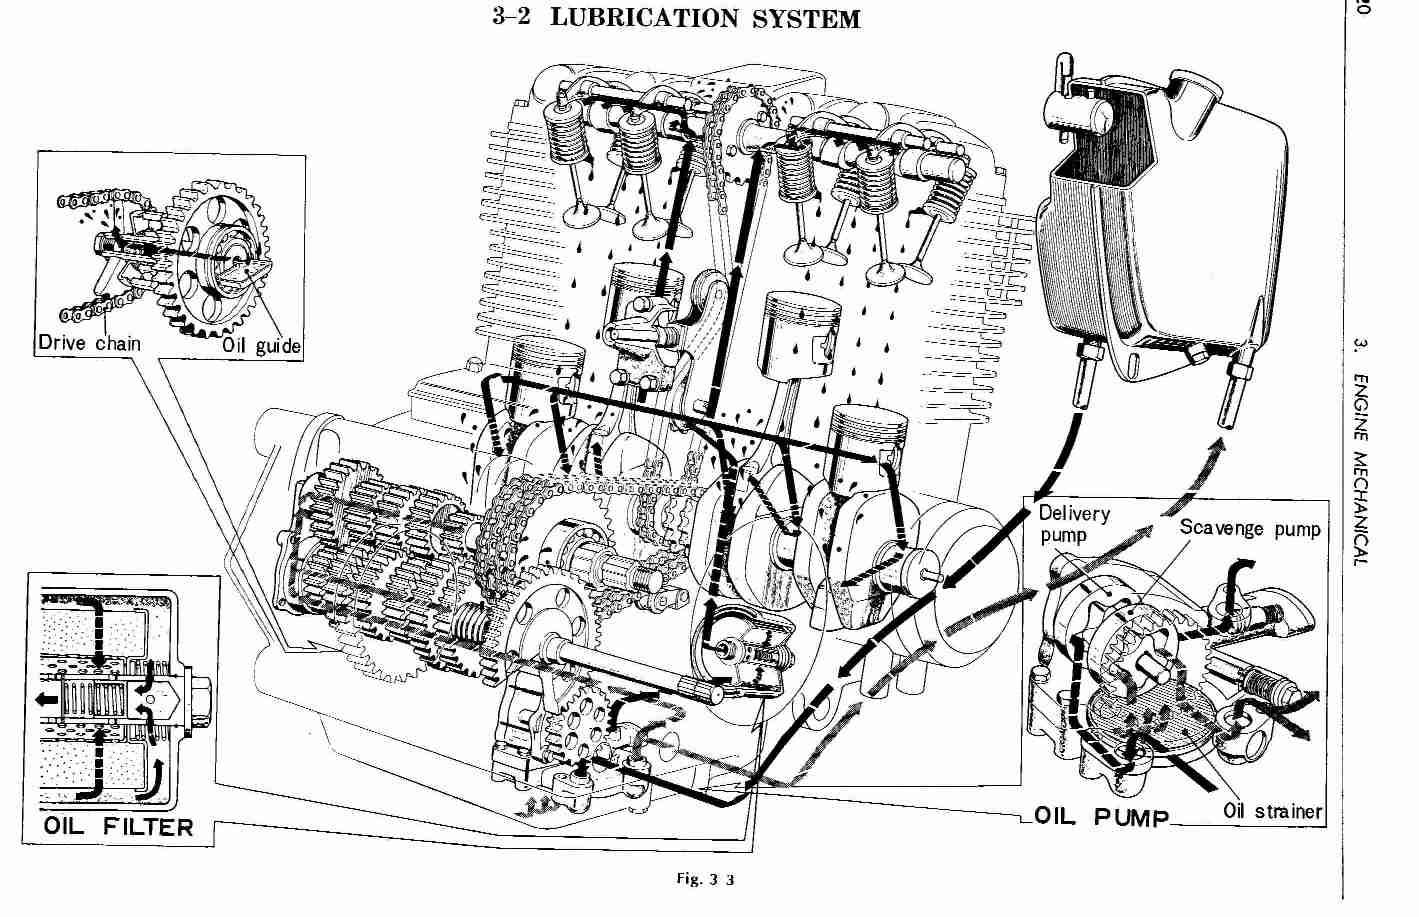 honda cb750 wiring diagram as well honda cb 750 wiring diagram as cb750k motor diagram wiring [ 1419 x 917 Pixel ]